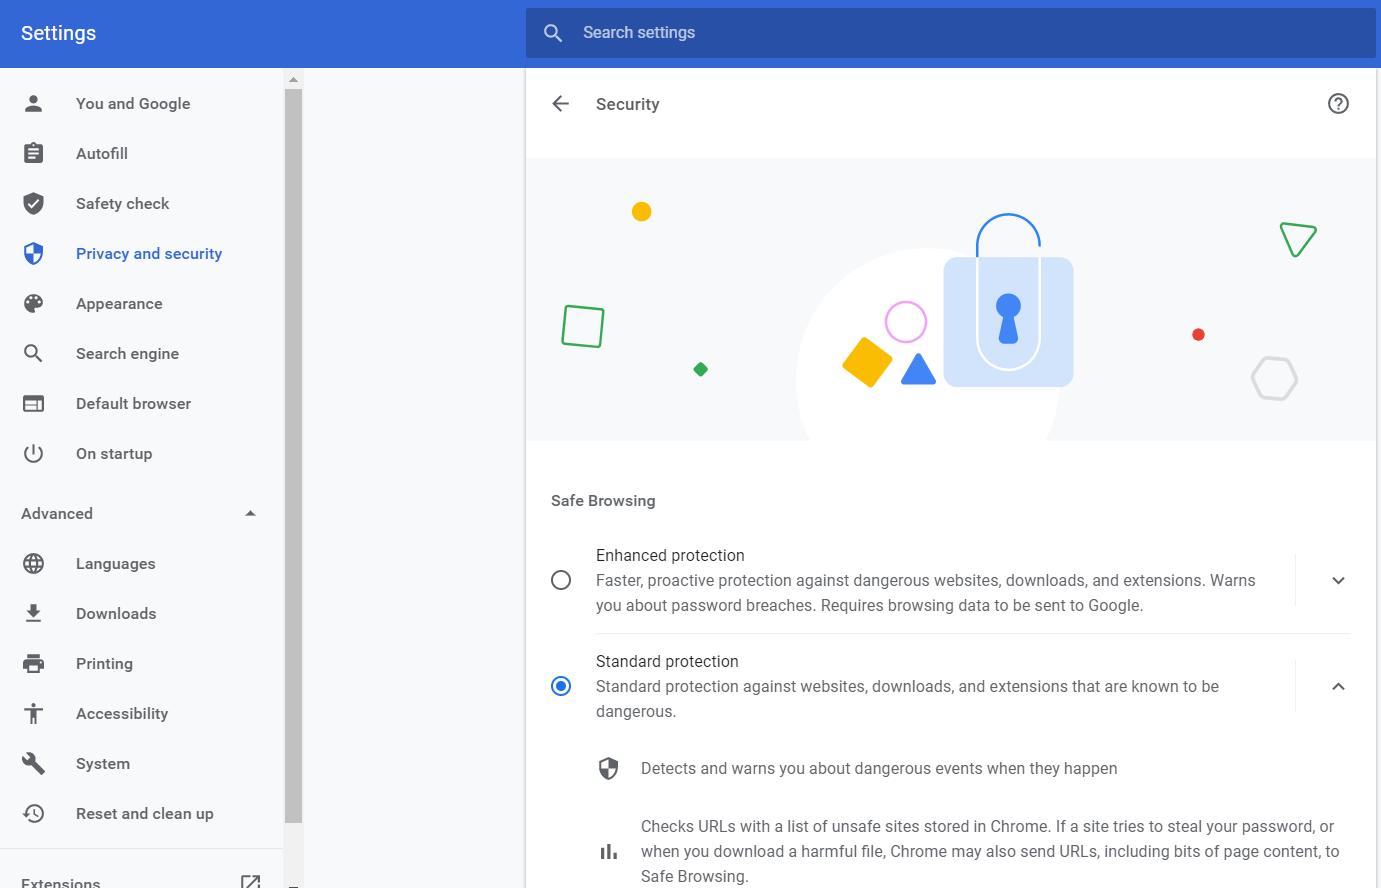 Google Chrome security options